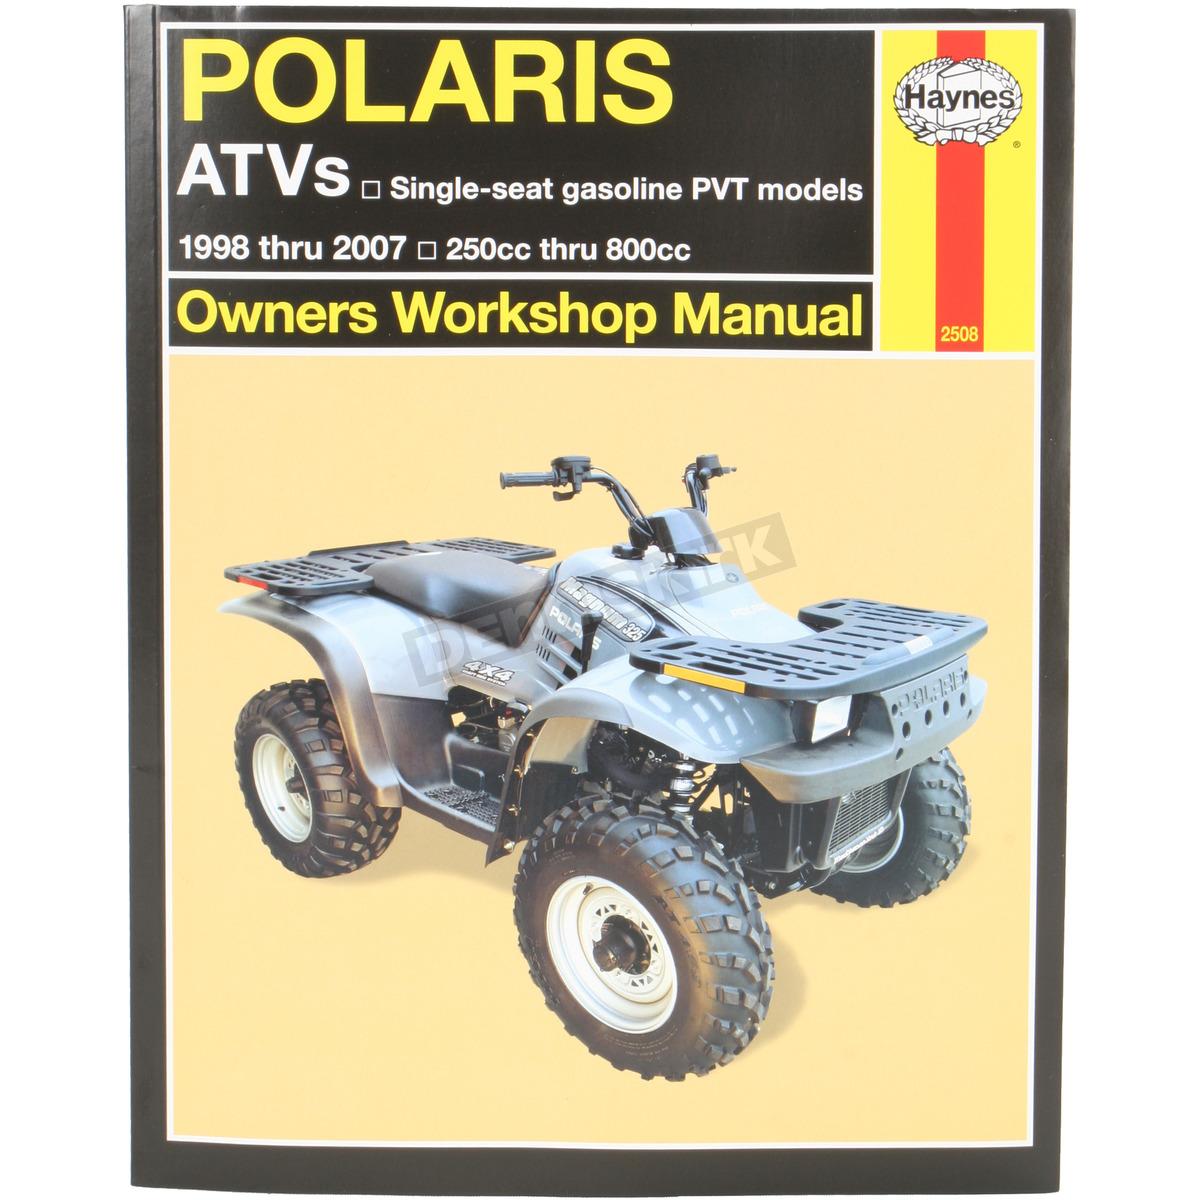 1998 polaris scrambler 500 repair manual reviewmotors co rh reviewmotors co 1998 polaris sportsman 500 parts manual Polaris Sportsman 500 Manual PDF